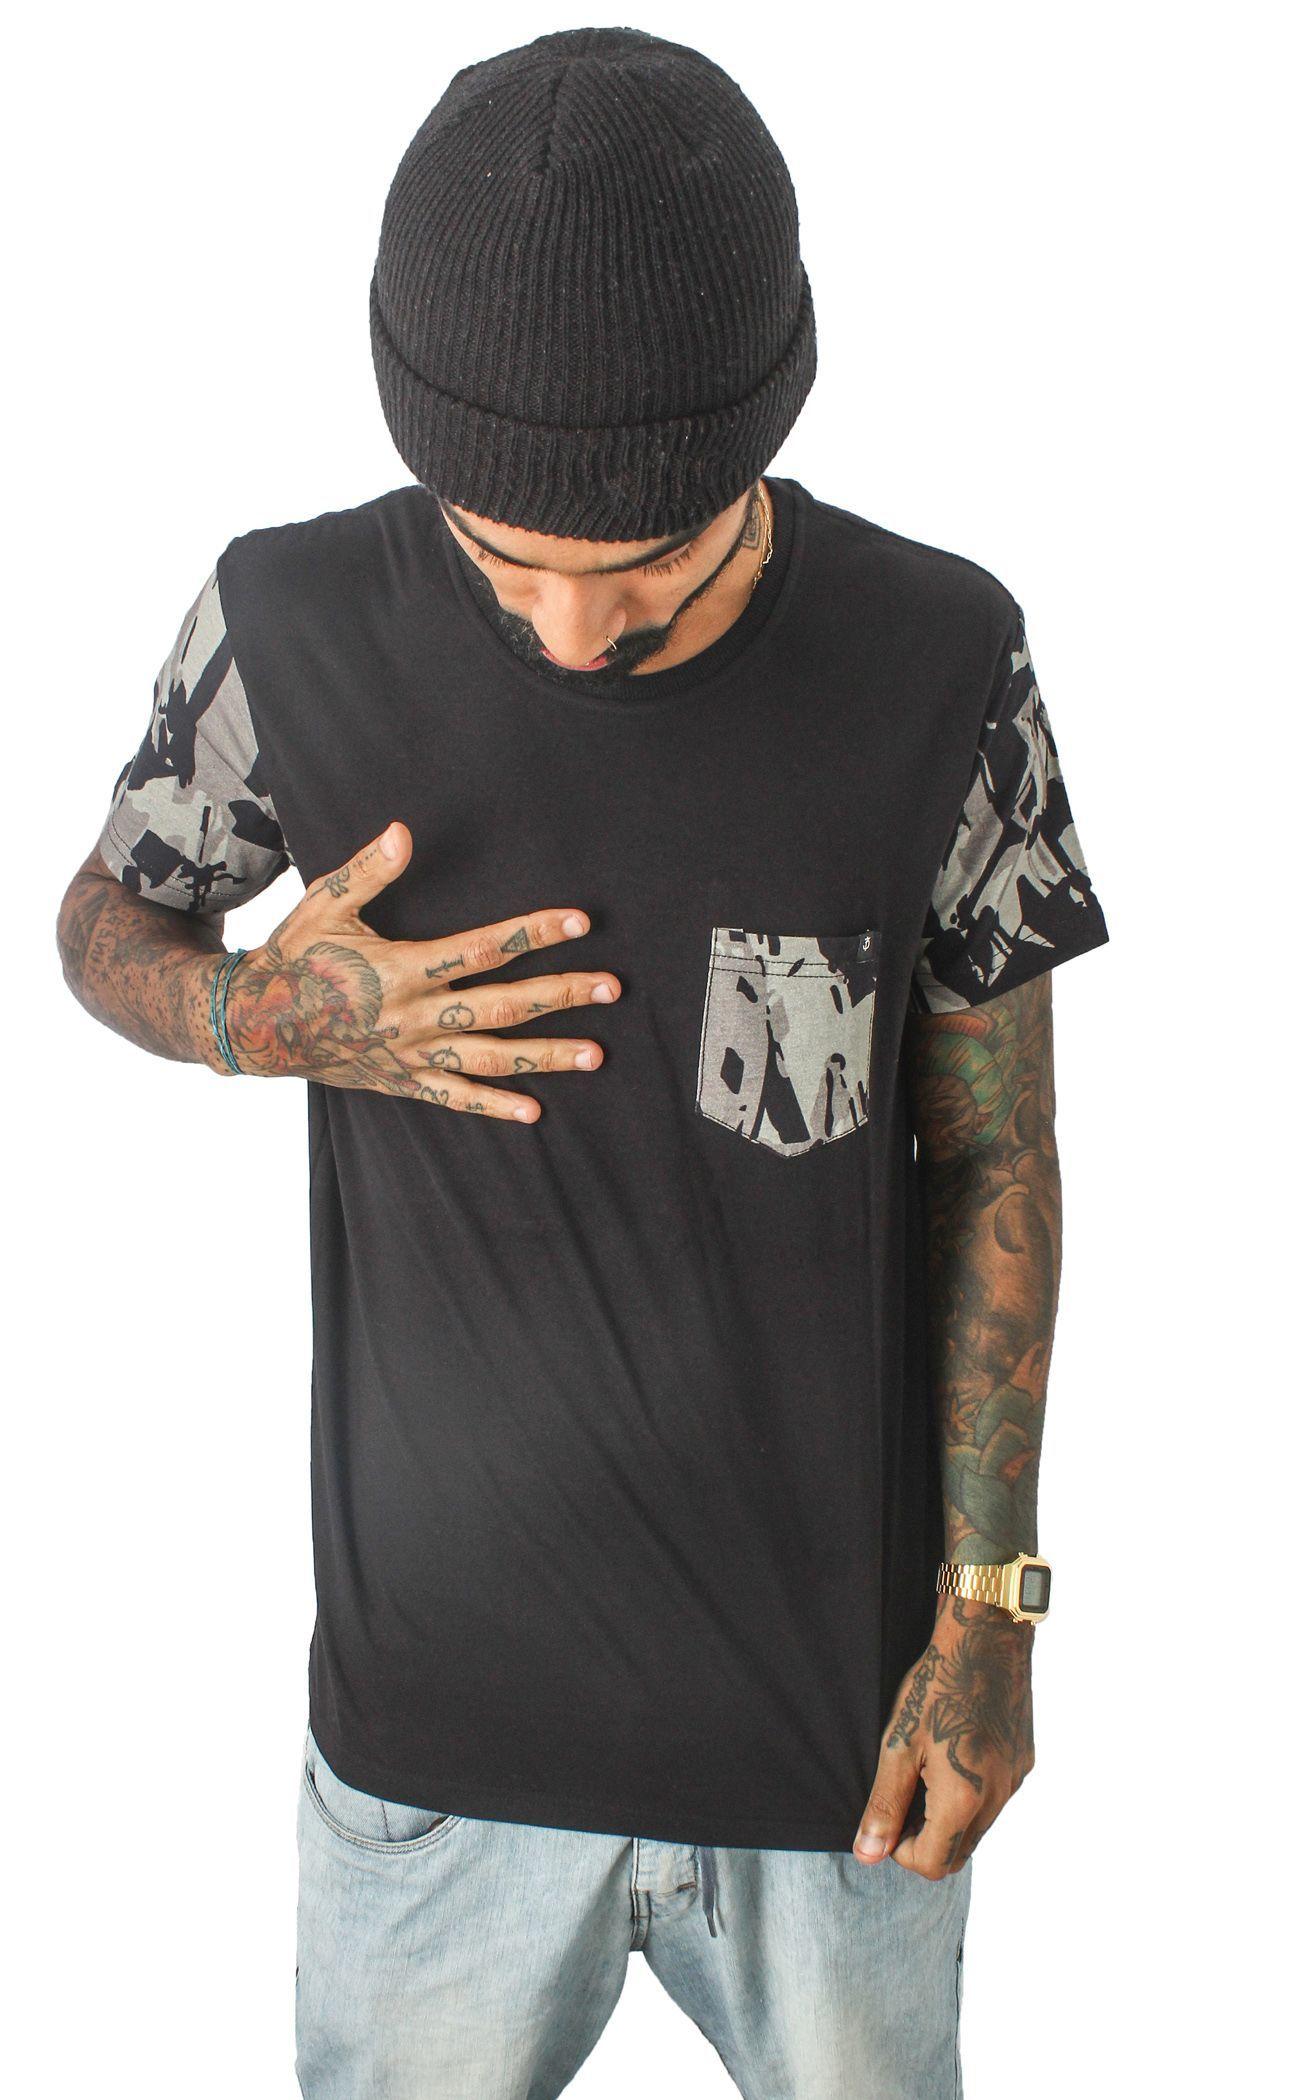 Camiseta Camo Mangas e Bolso - 31 CLOTHING